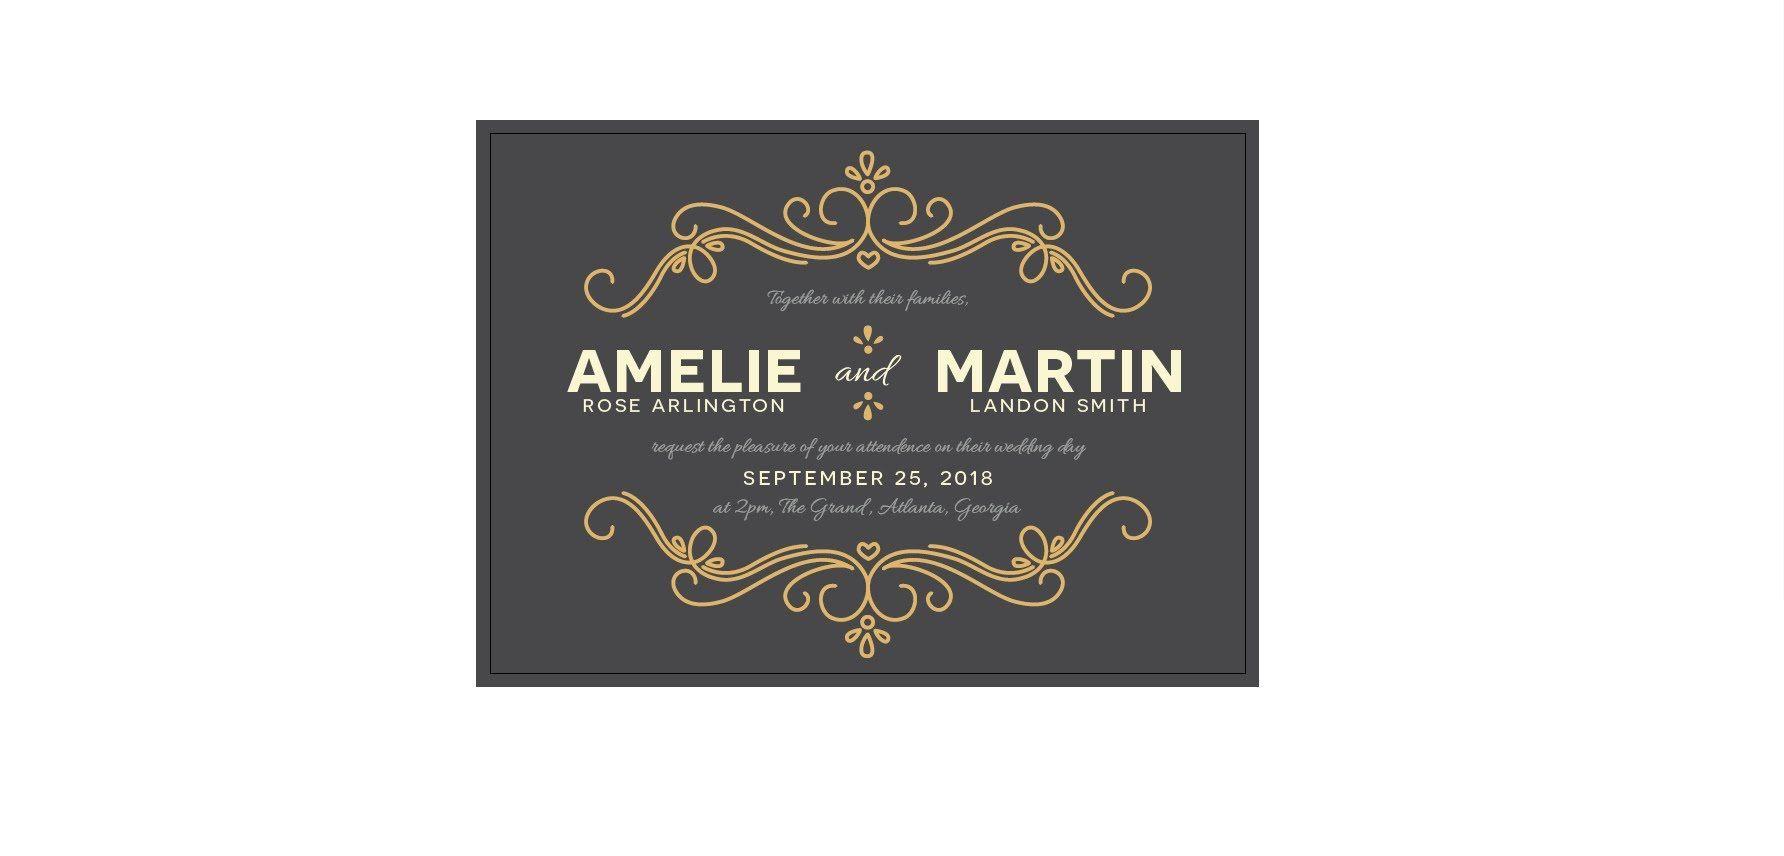 How to Create a Wedding Invitation in Illustrator | Illustrator ...